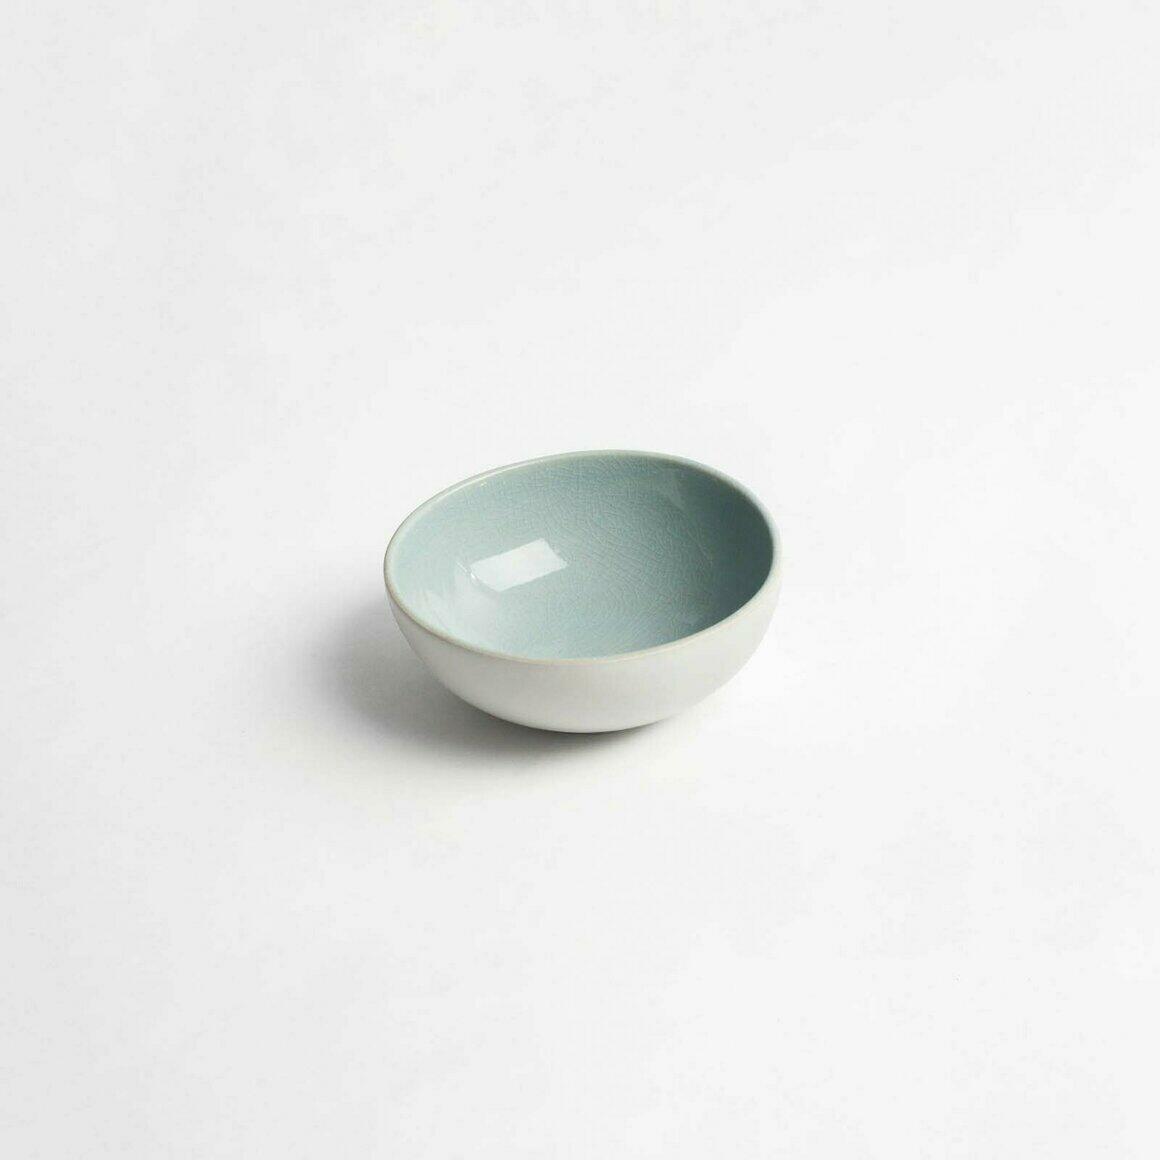 Small Pinch Bowl | Trada Marketplace